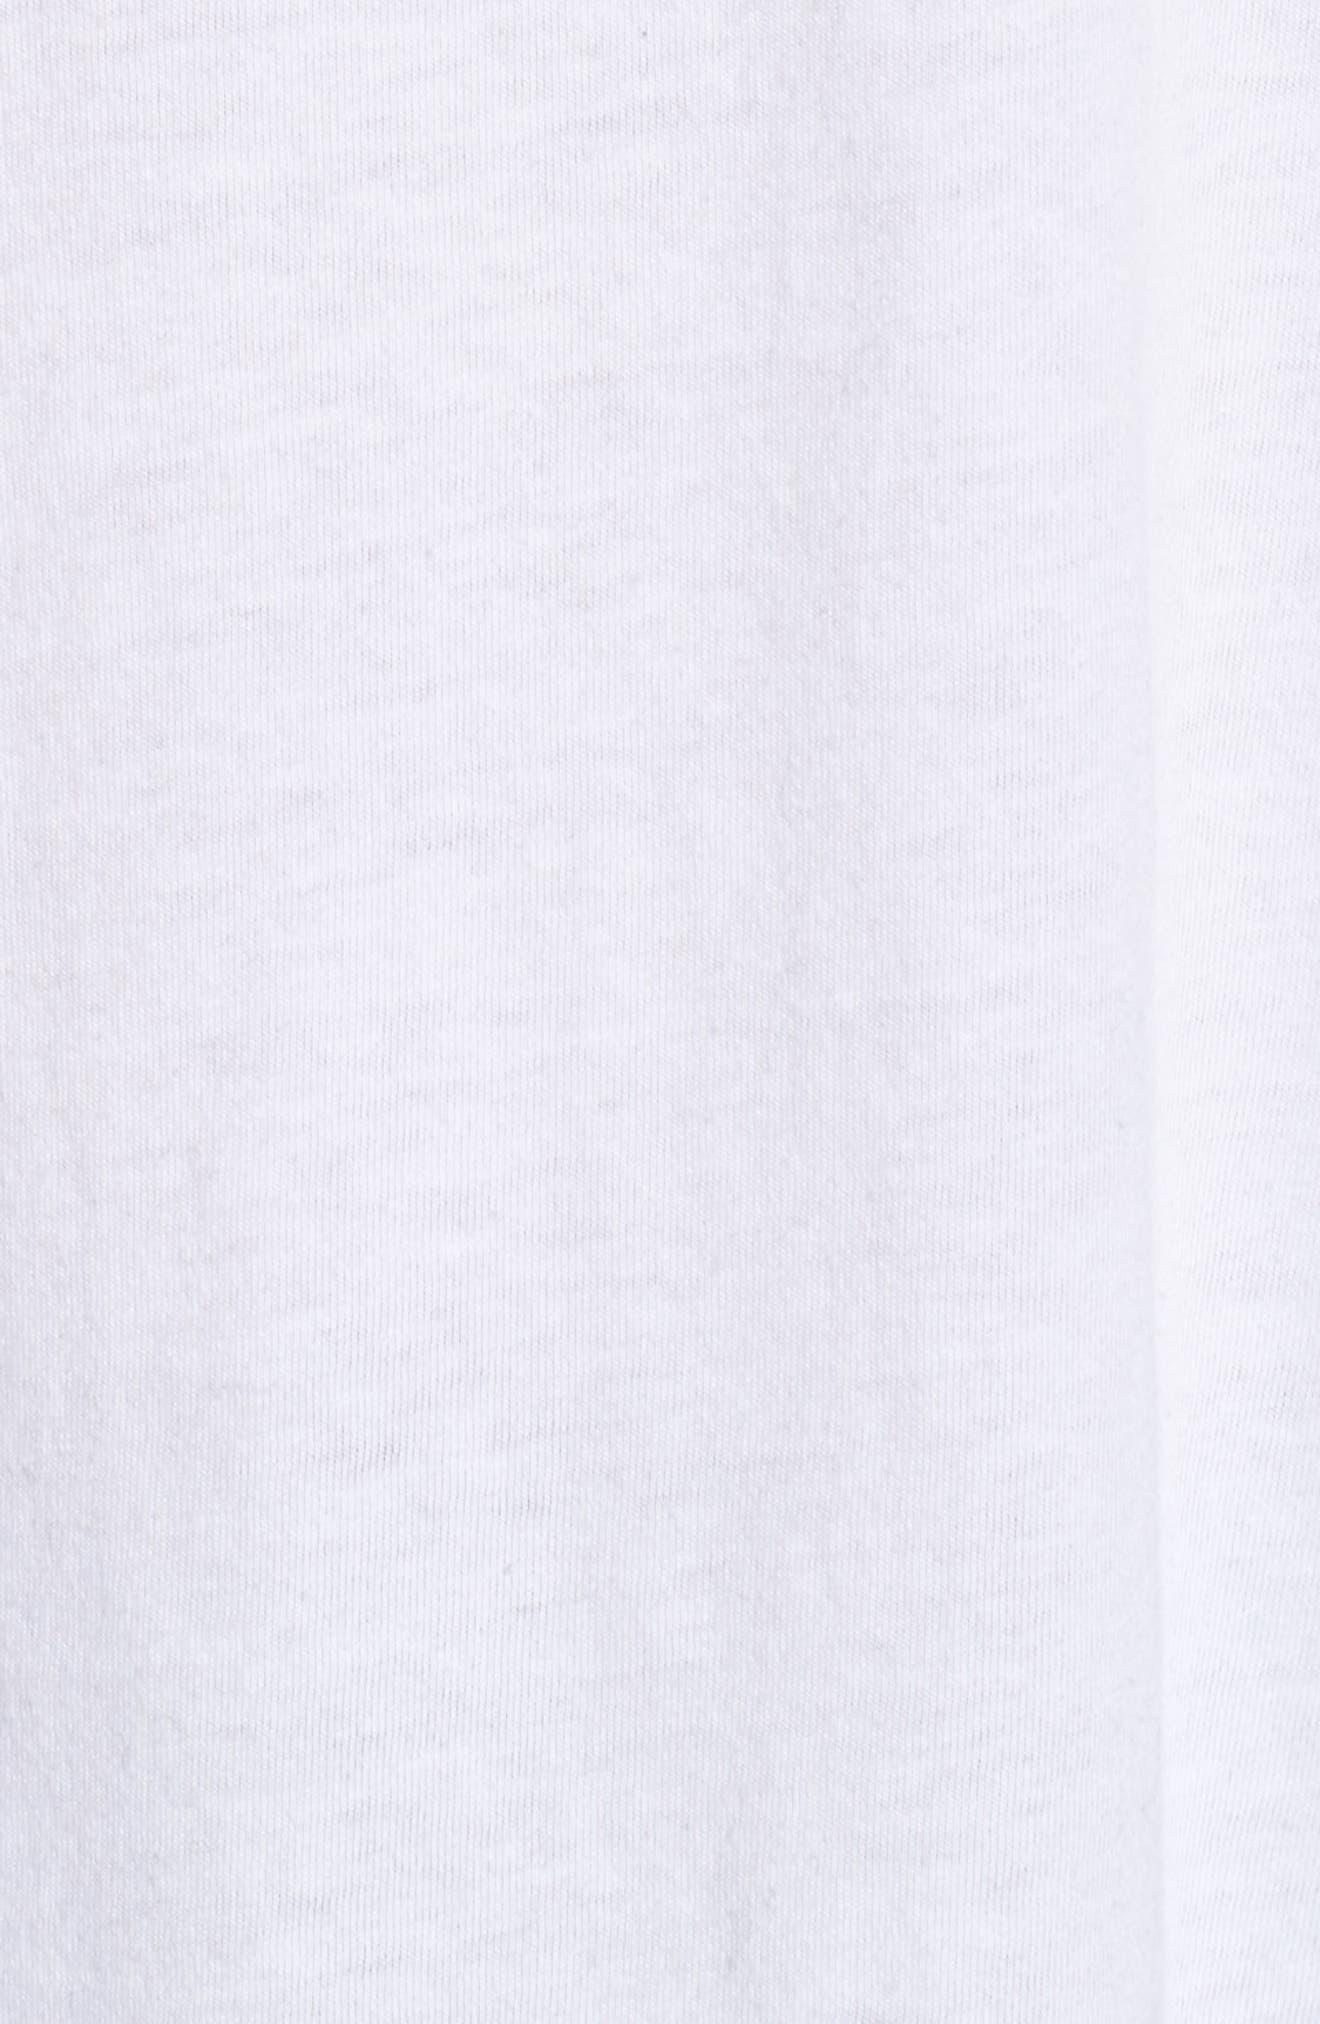 Bowie Raglan Tee,                             Alternate thumbnail 6, color,                             White Black